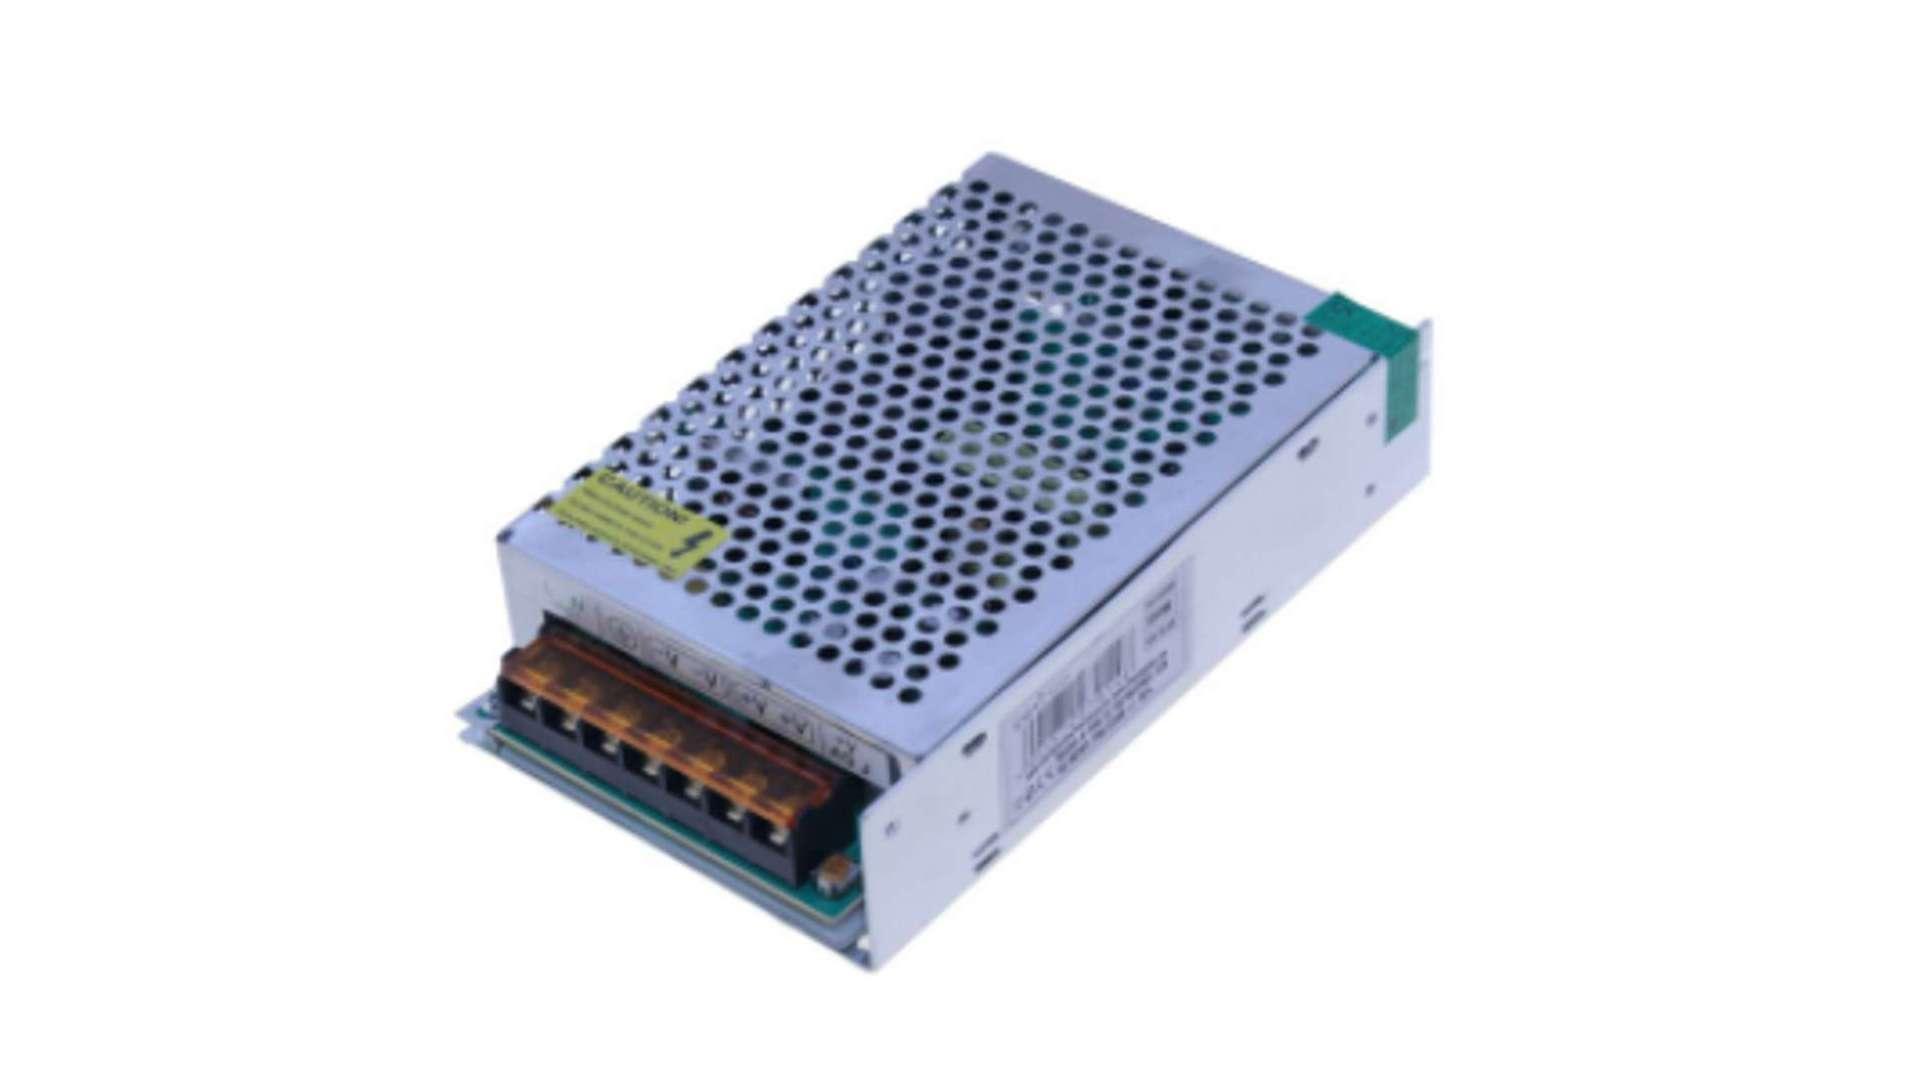 12V 75W IP20 enclosed power supply